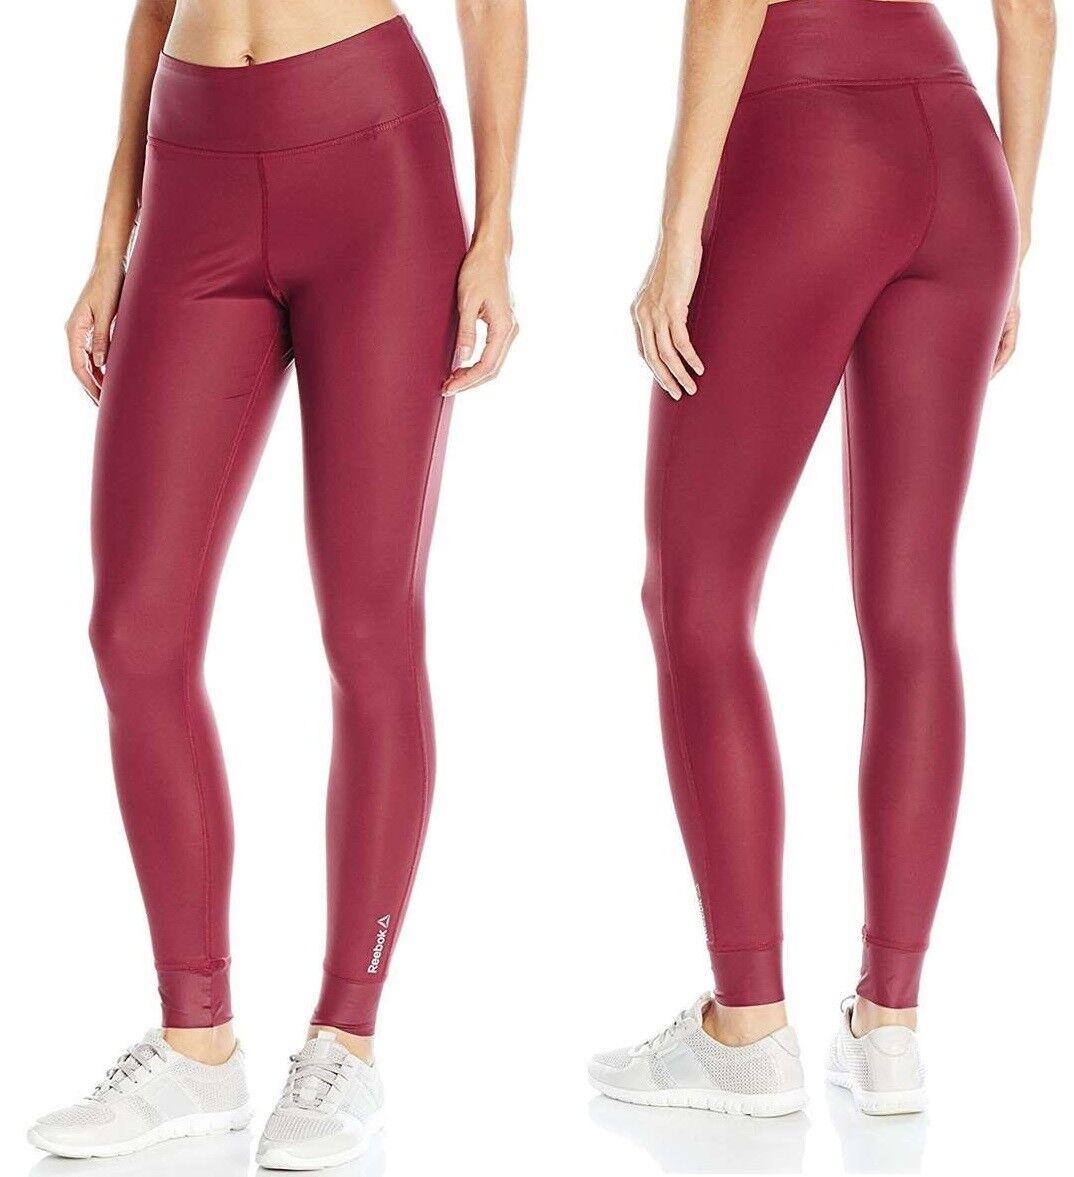 Reebok donna Studio Lux Regular Fit Polyester Sports Gym Leggings nuovo